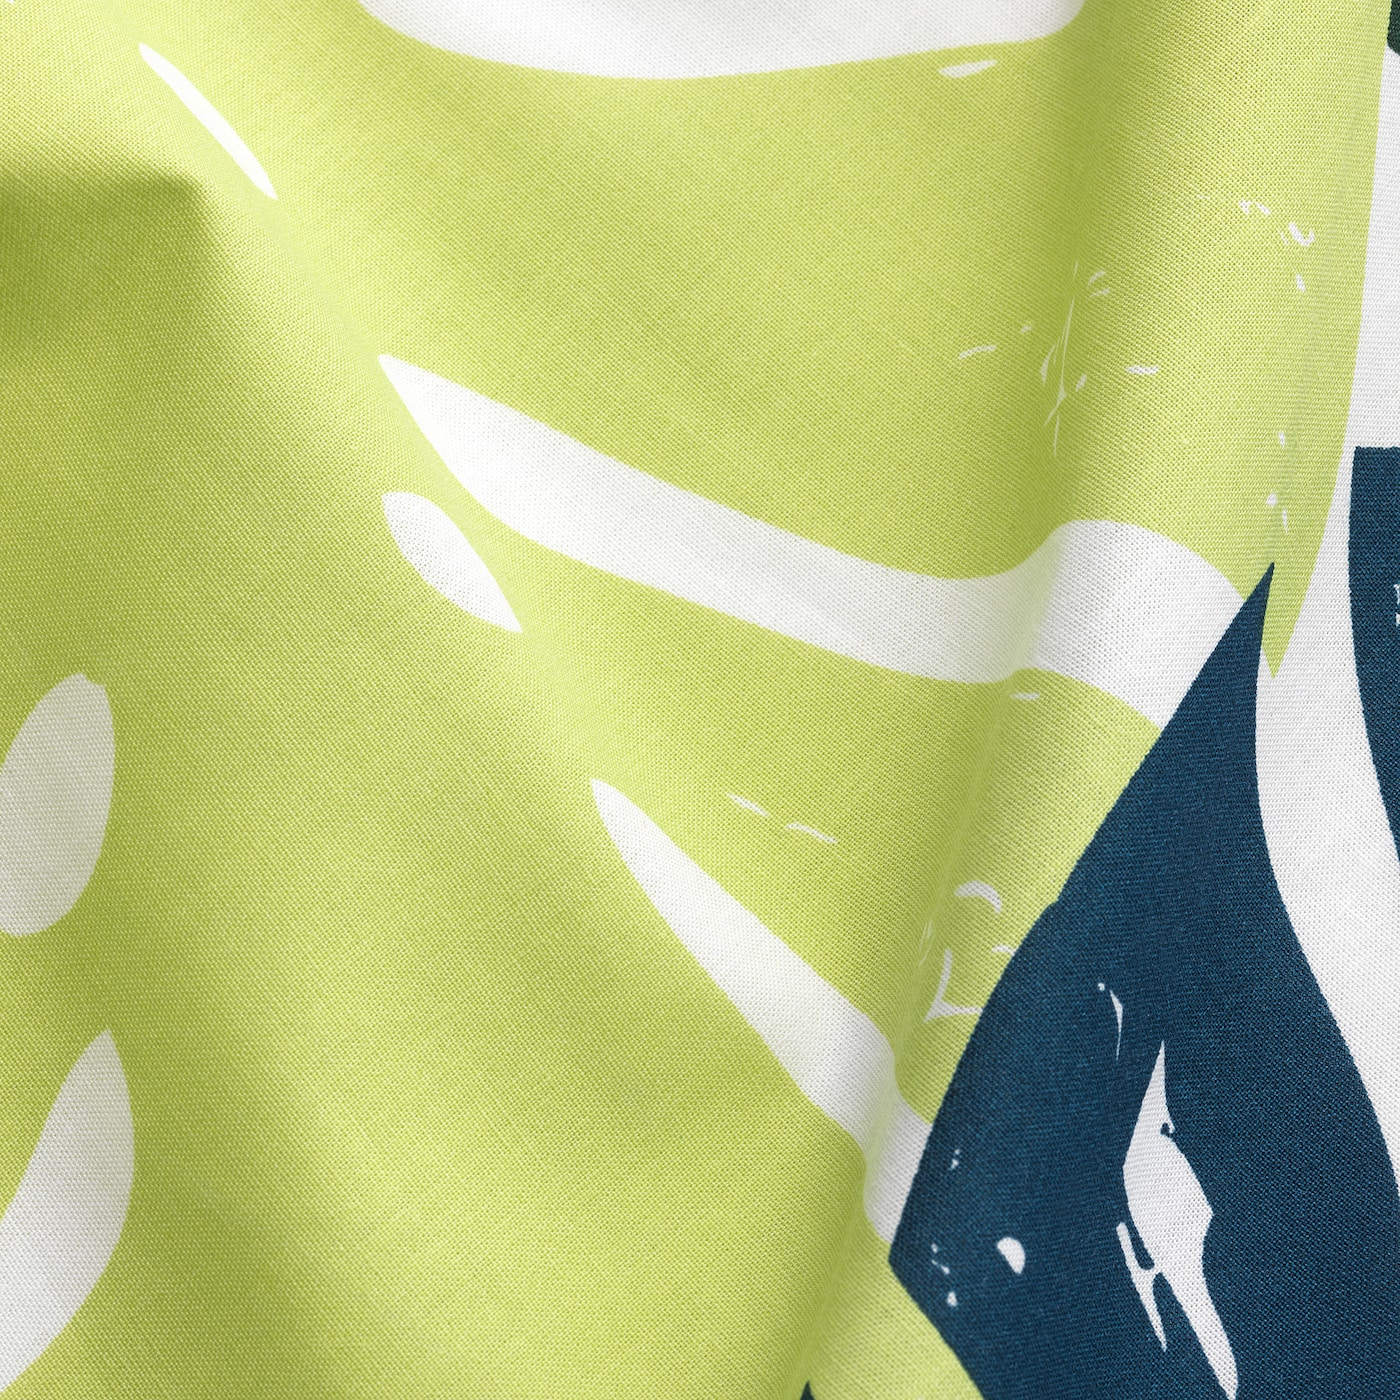 URSKOG Curtains with tie-backs, 1 pair, green, 120x300 cm